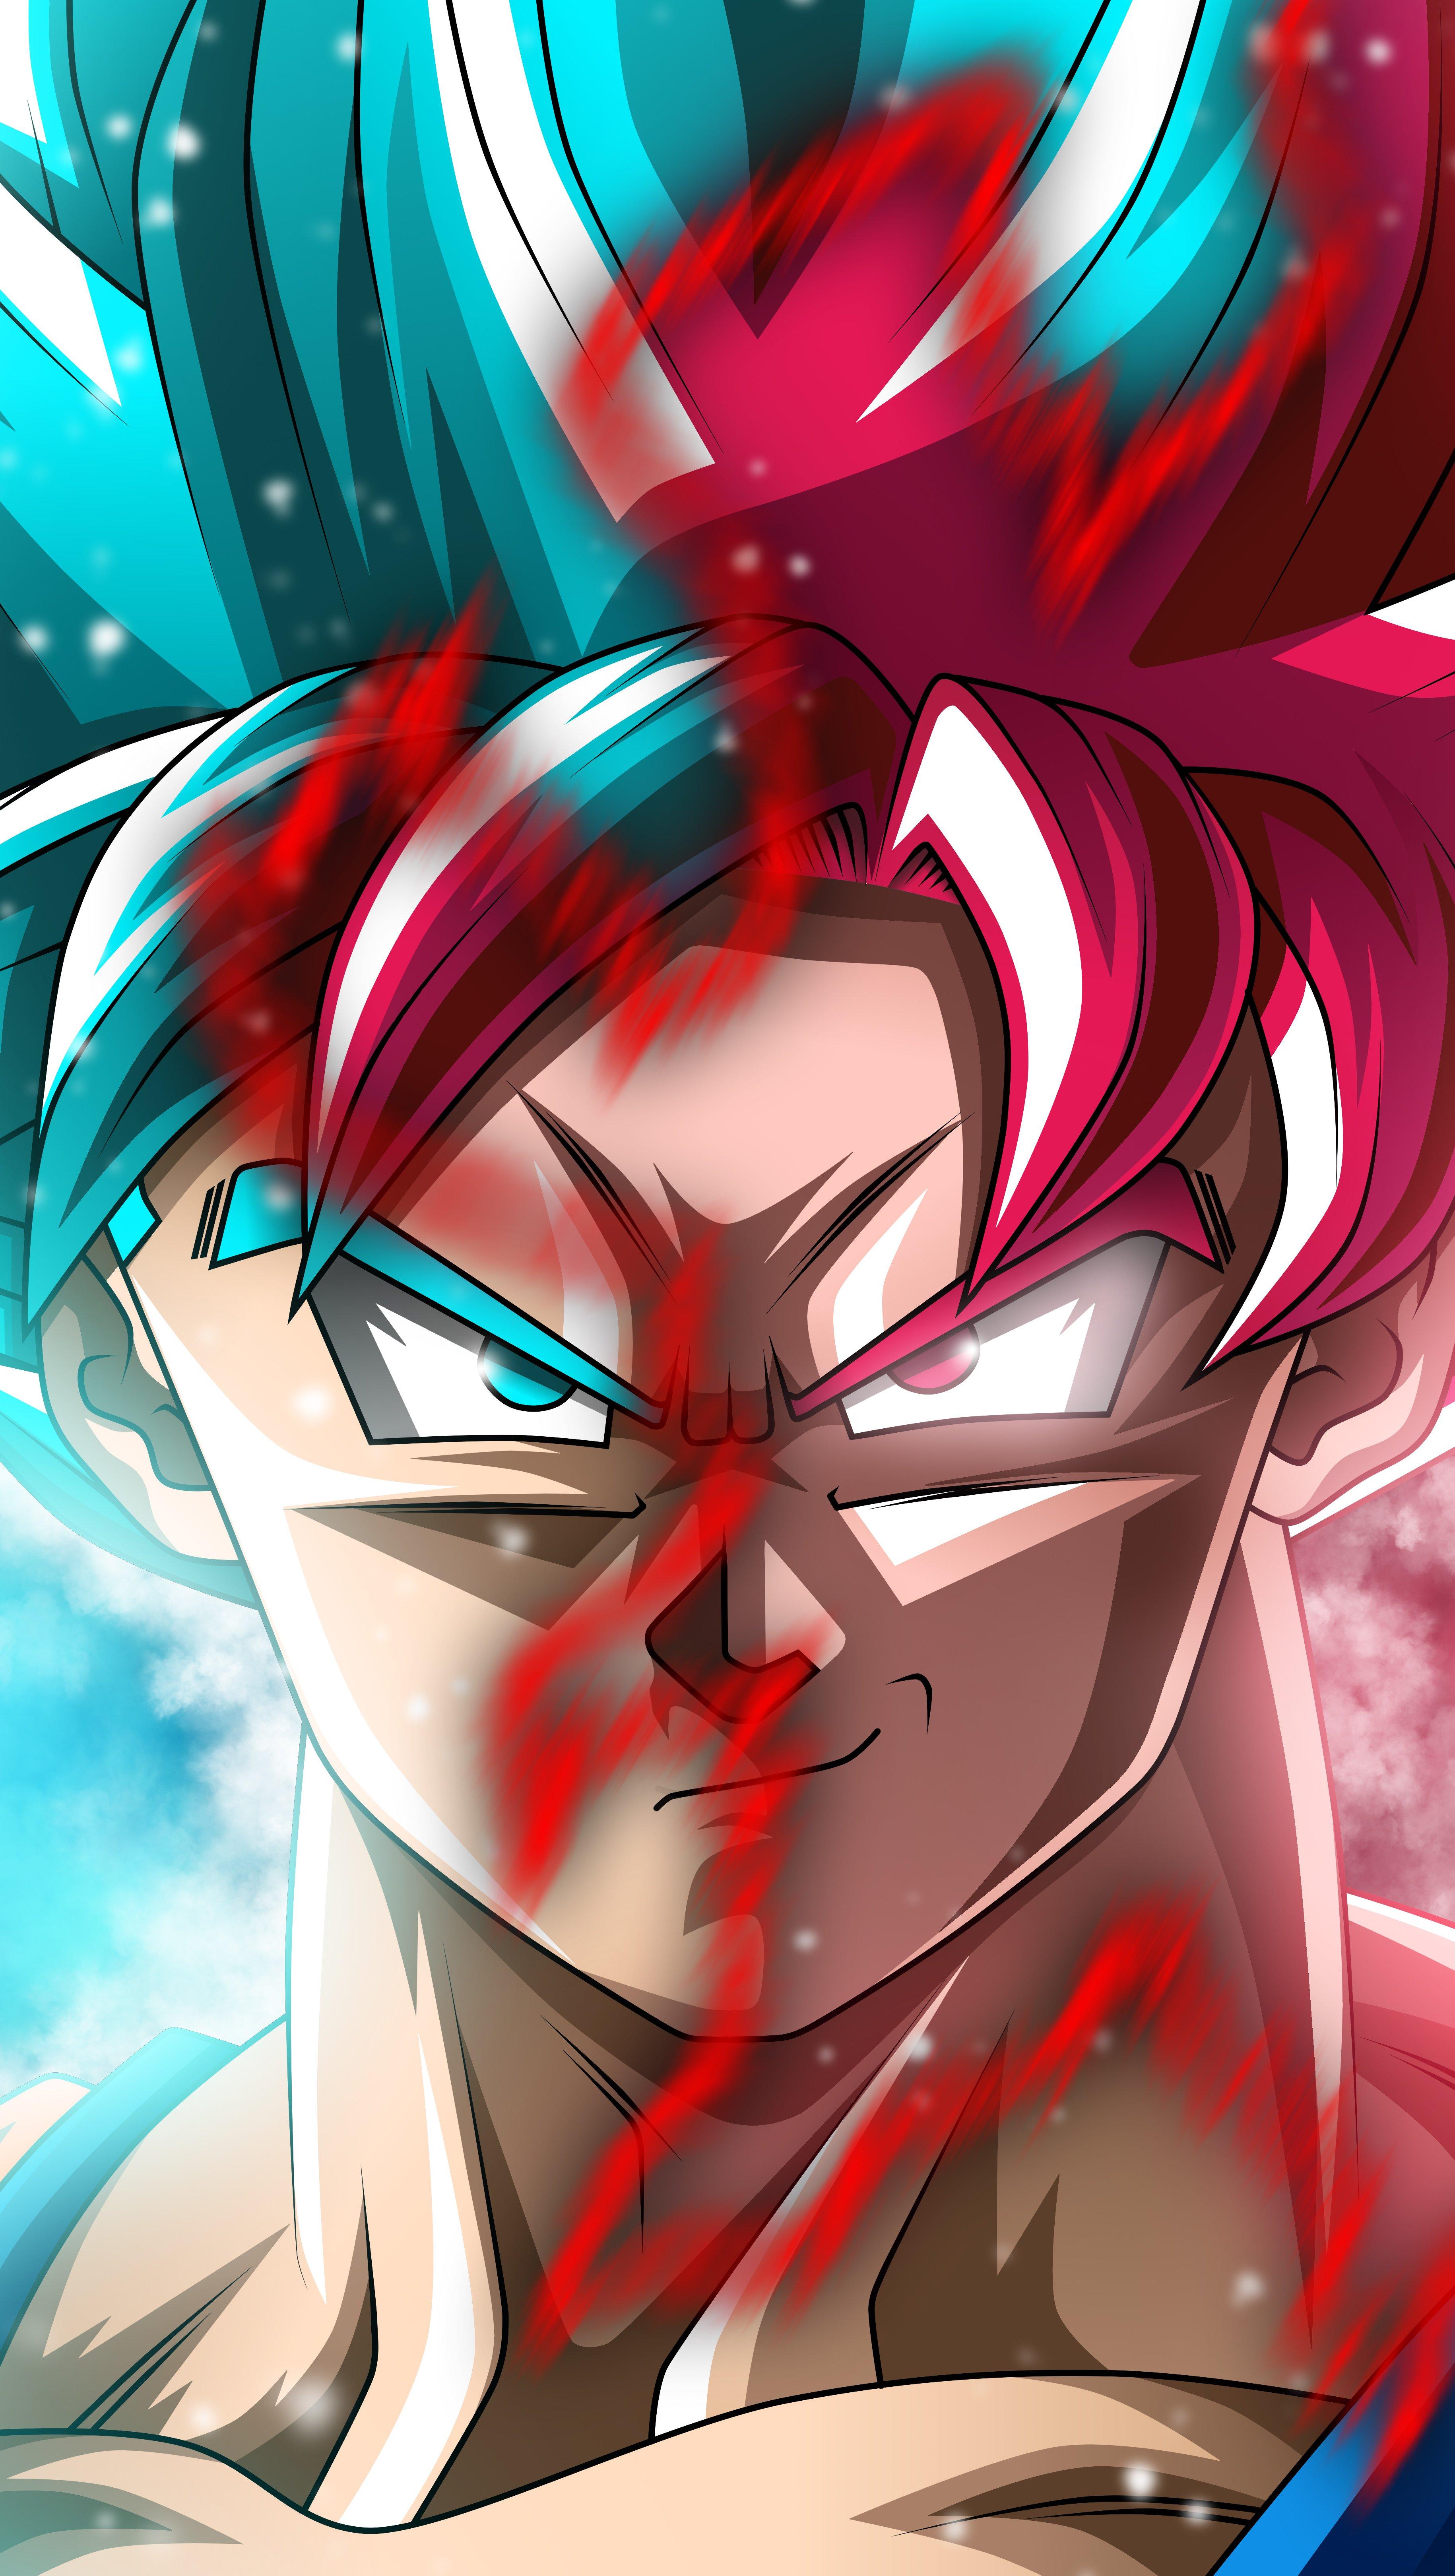 Fondos de pantalla Anime Goku Super Saiyan Blue and Black Goku SSR Dragon Ball Super Vertical